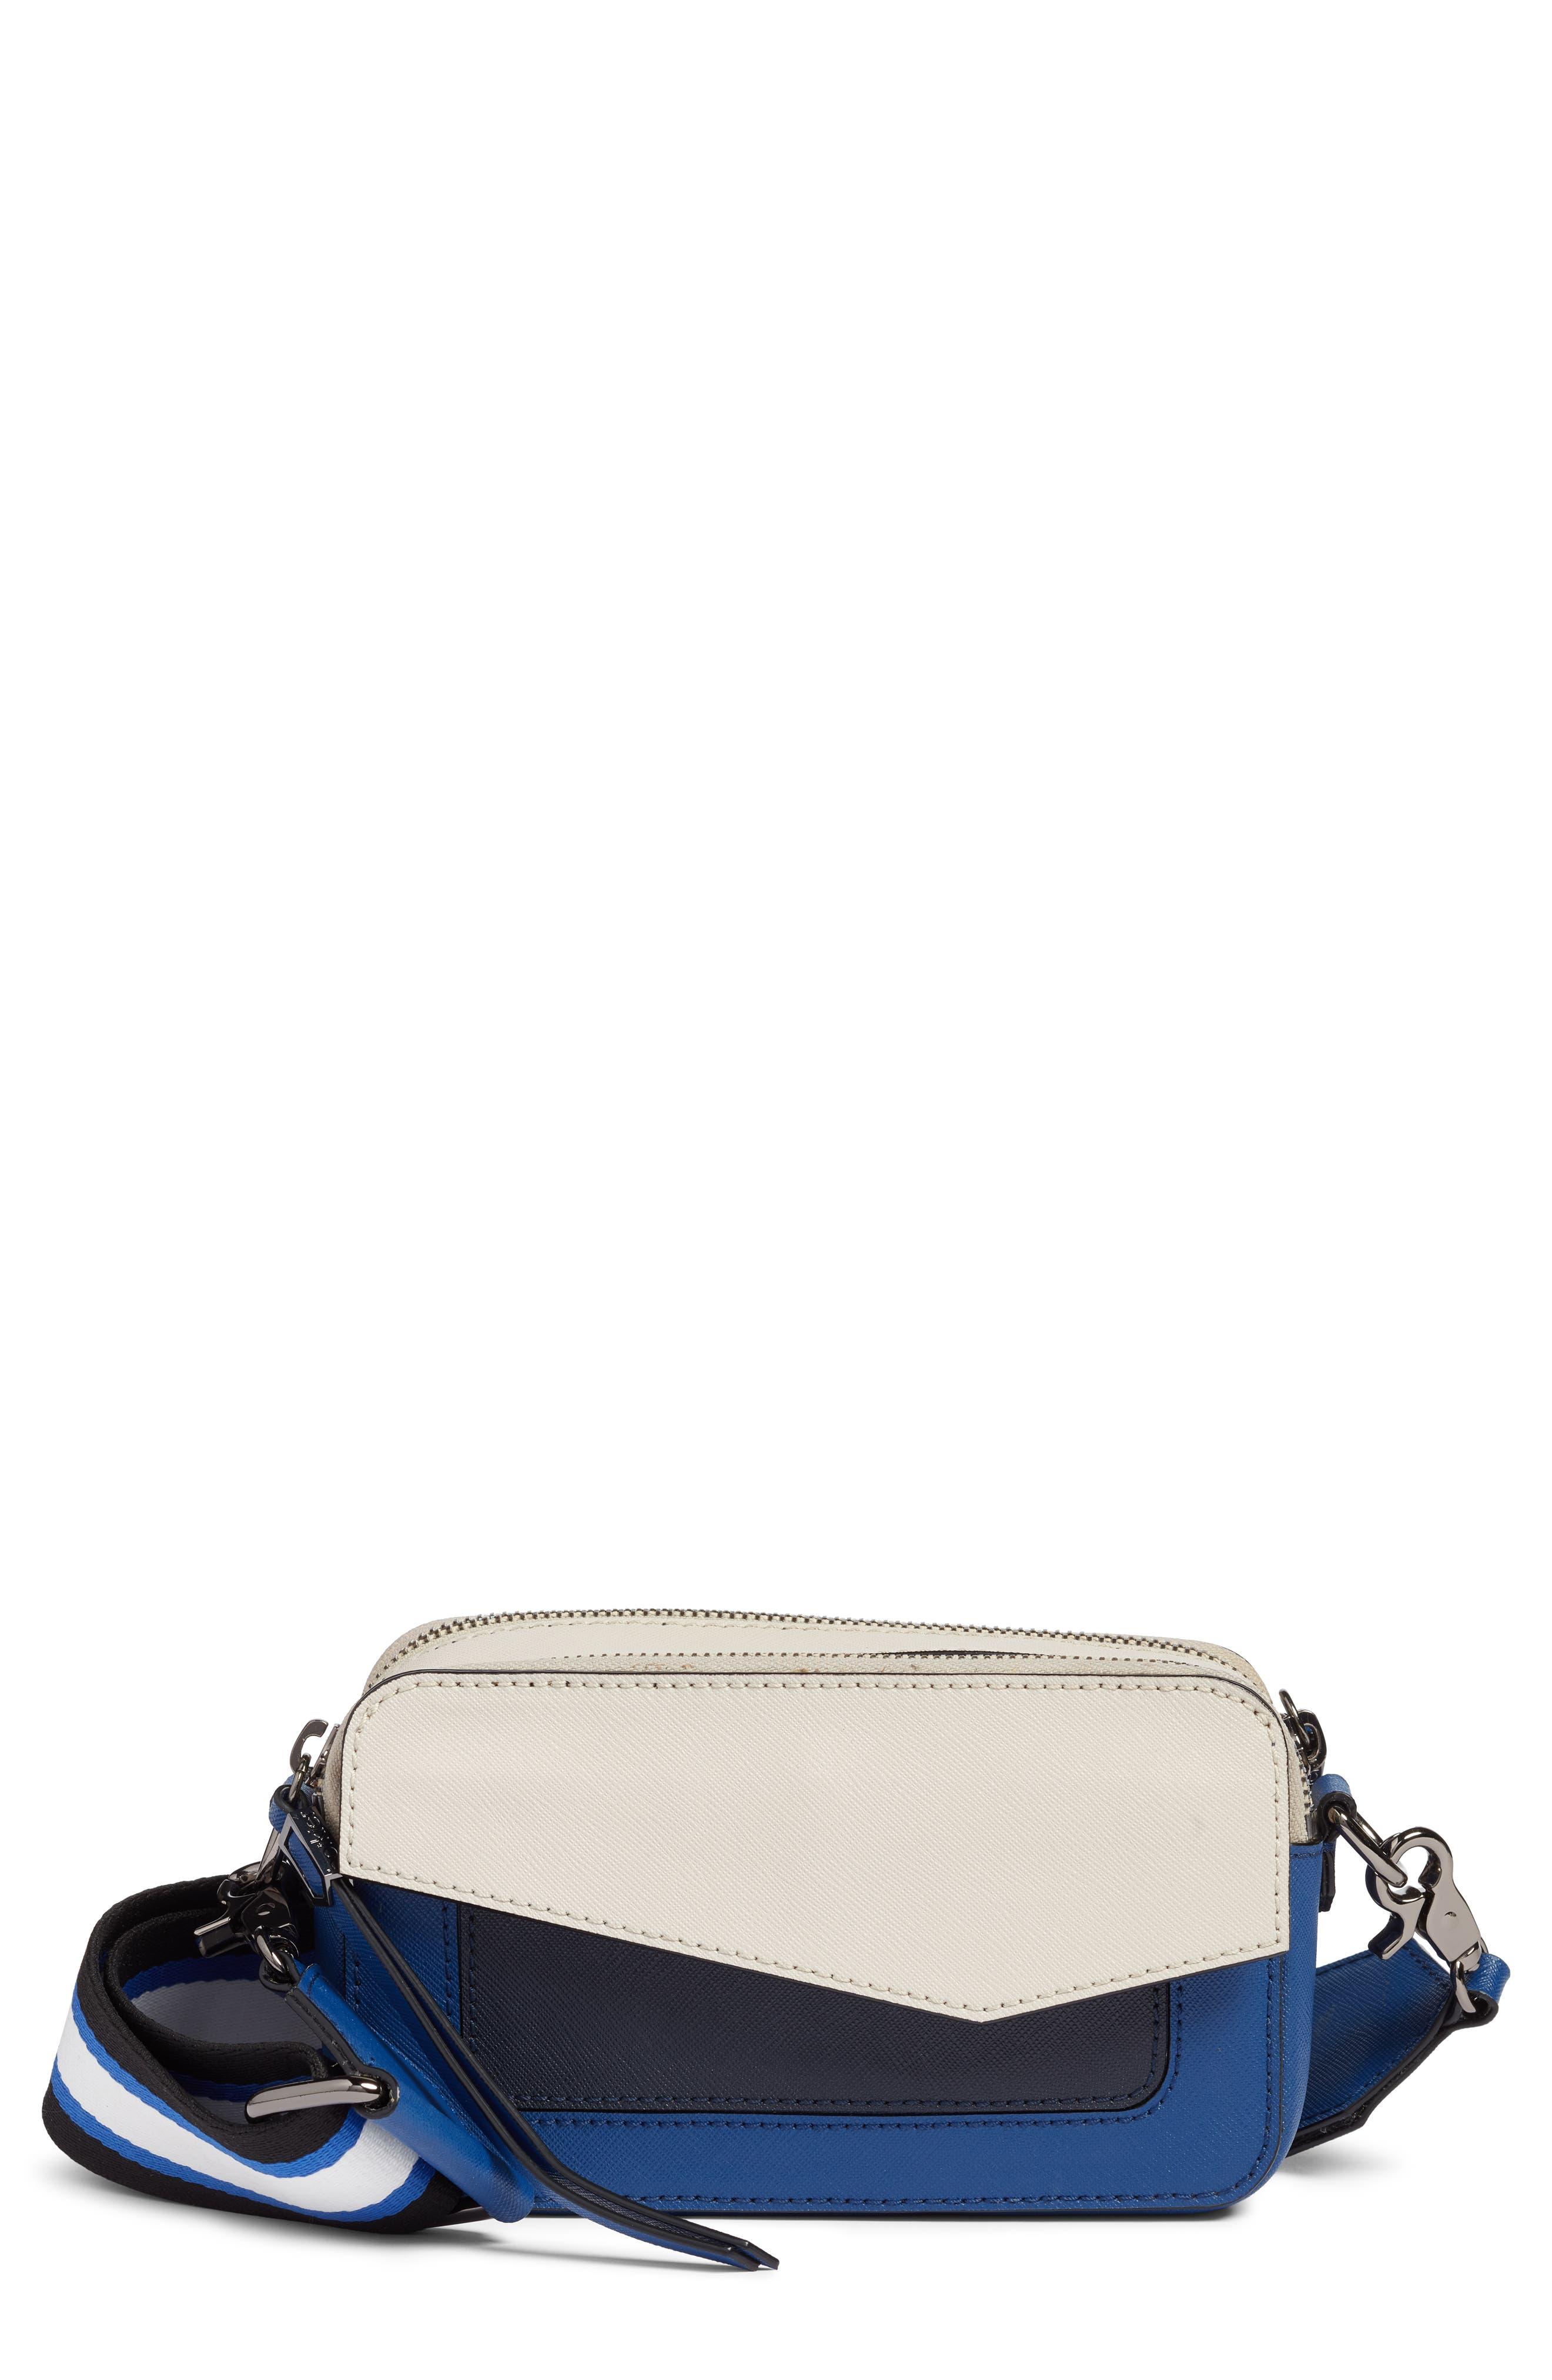 Cobble Hill Mini Crossbody Camera Bag,                             Main thumbnail 1, color,                             WINTER BLUE COMBO